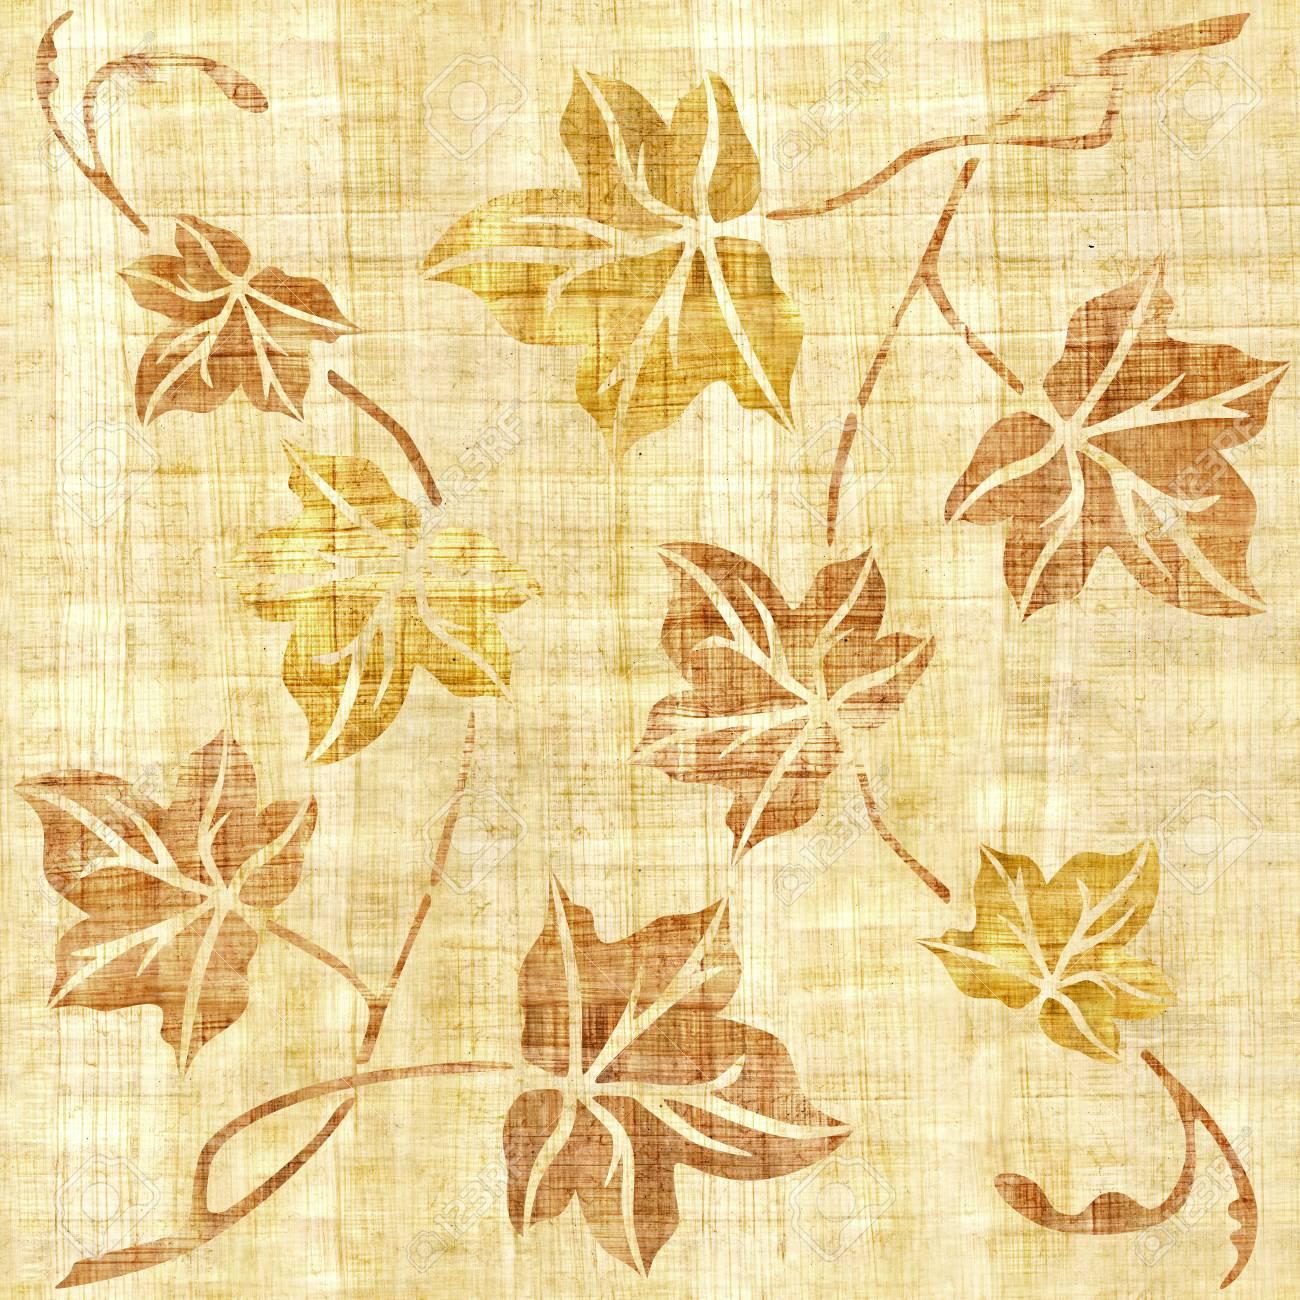 Decorative Tree Leaves - Seamless Background - Interior Wallpaper ...